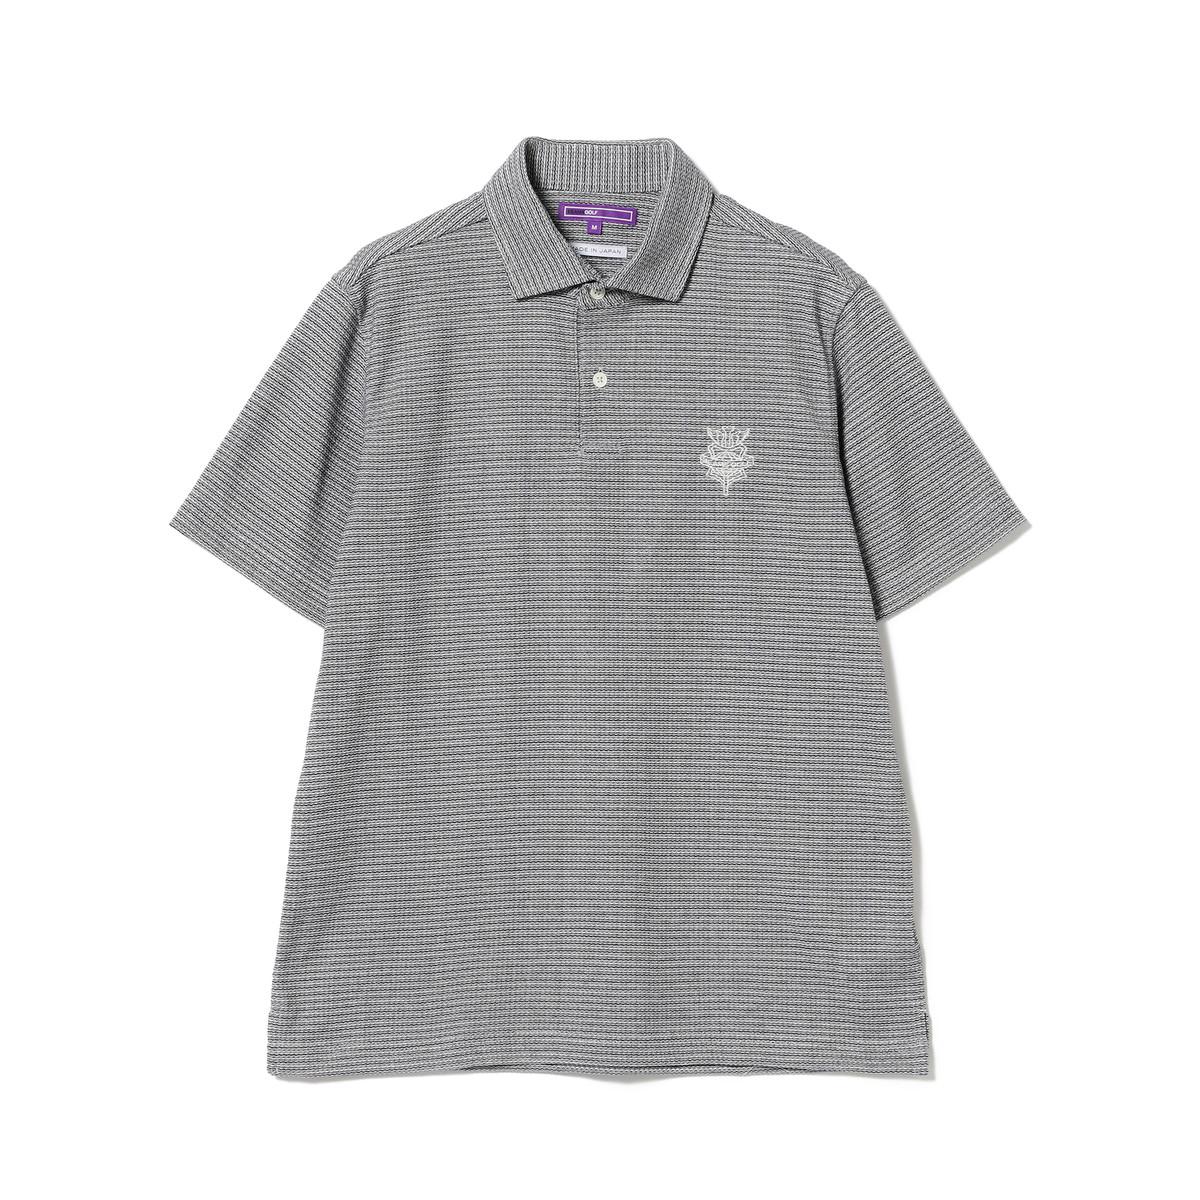 BEAMS GOLF PURPLE LABEL クールマックス リンクス ポロシャツ